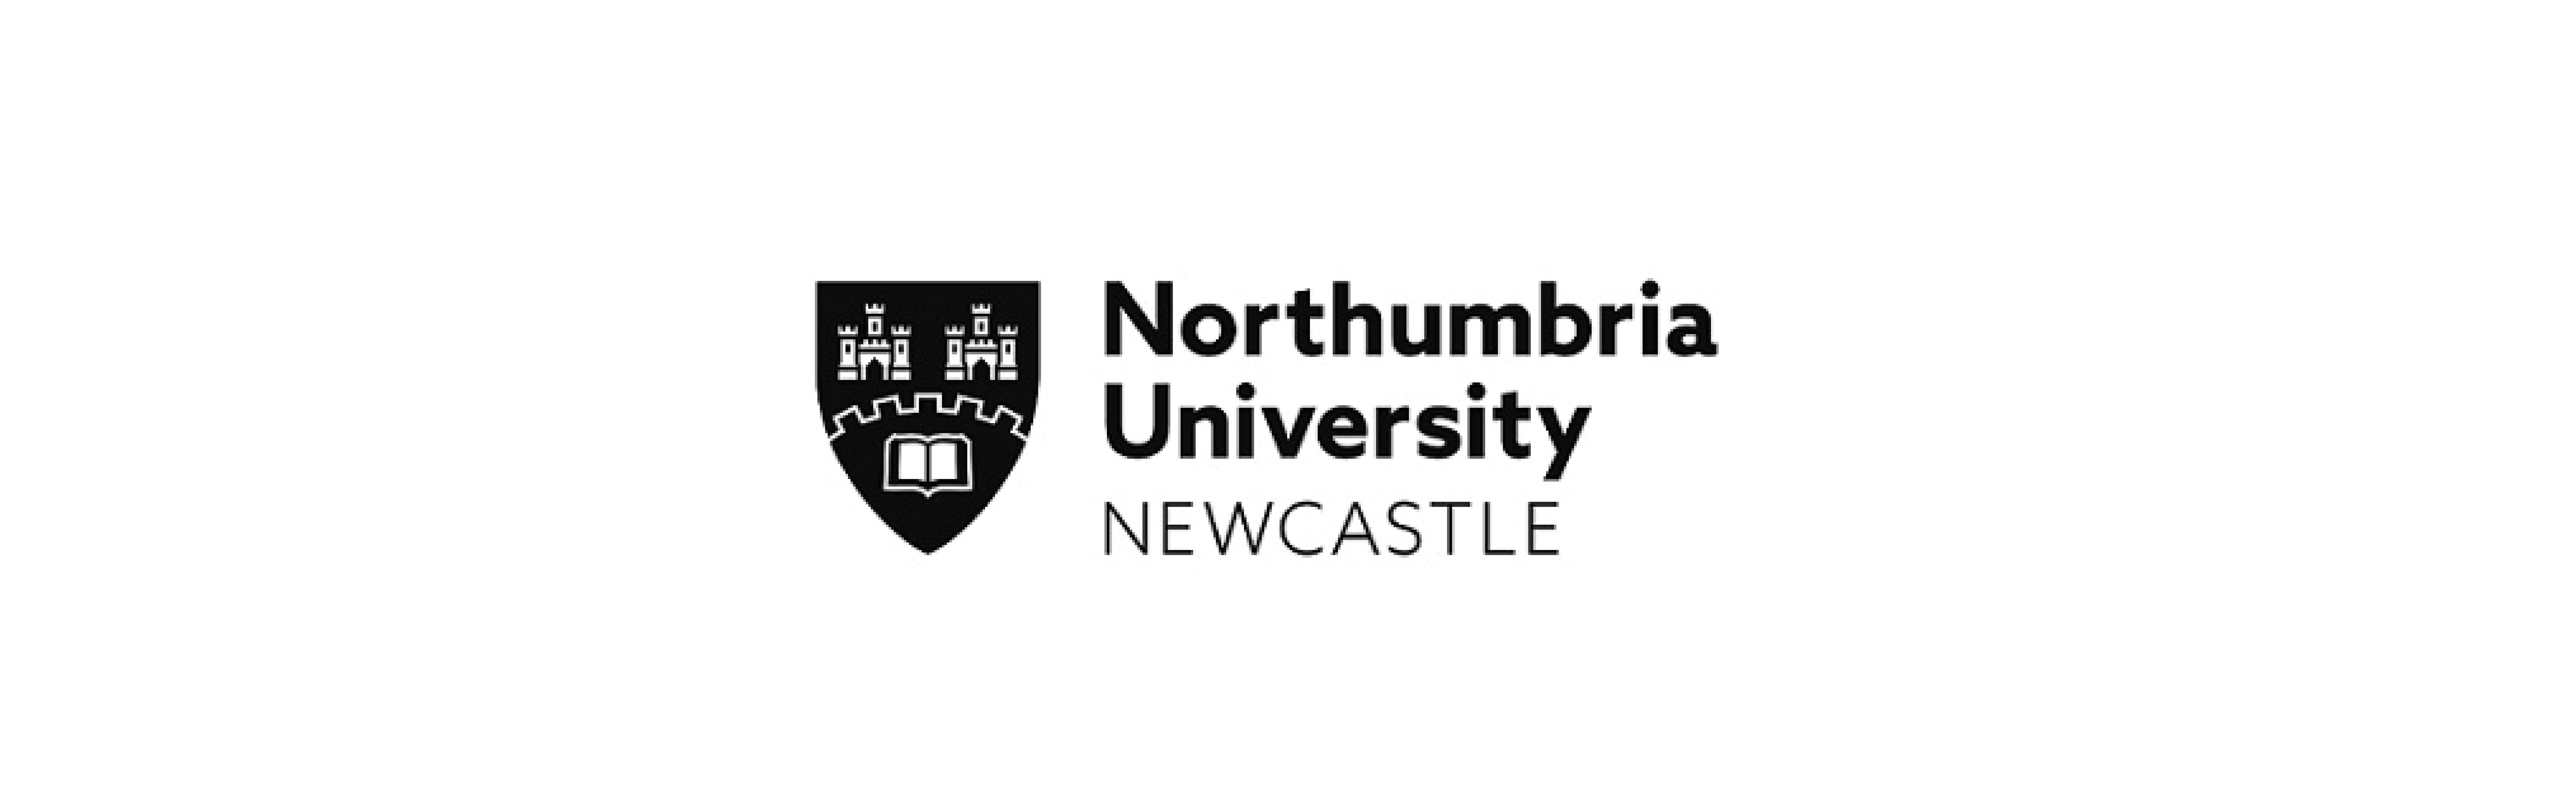 Widening Participation - Northumbria University